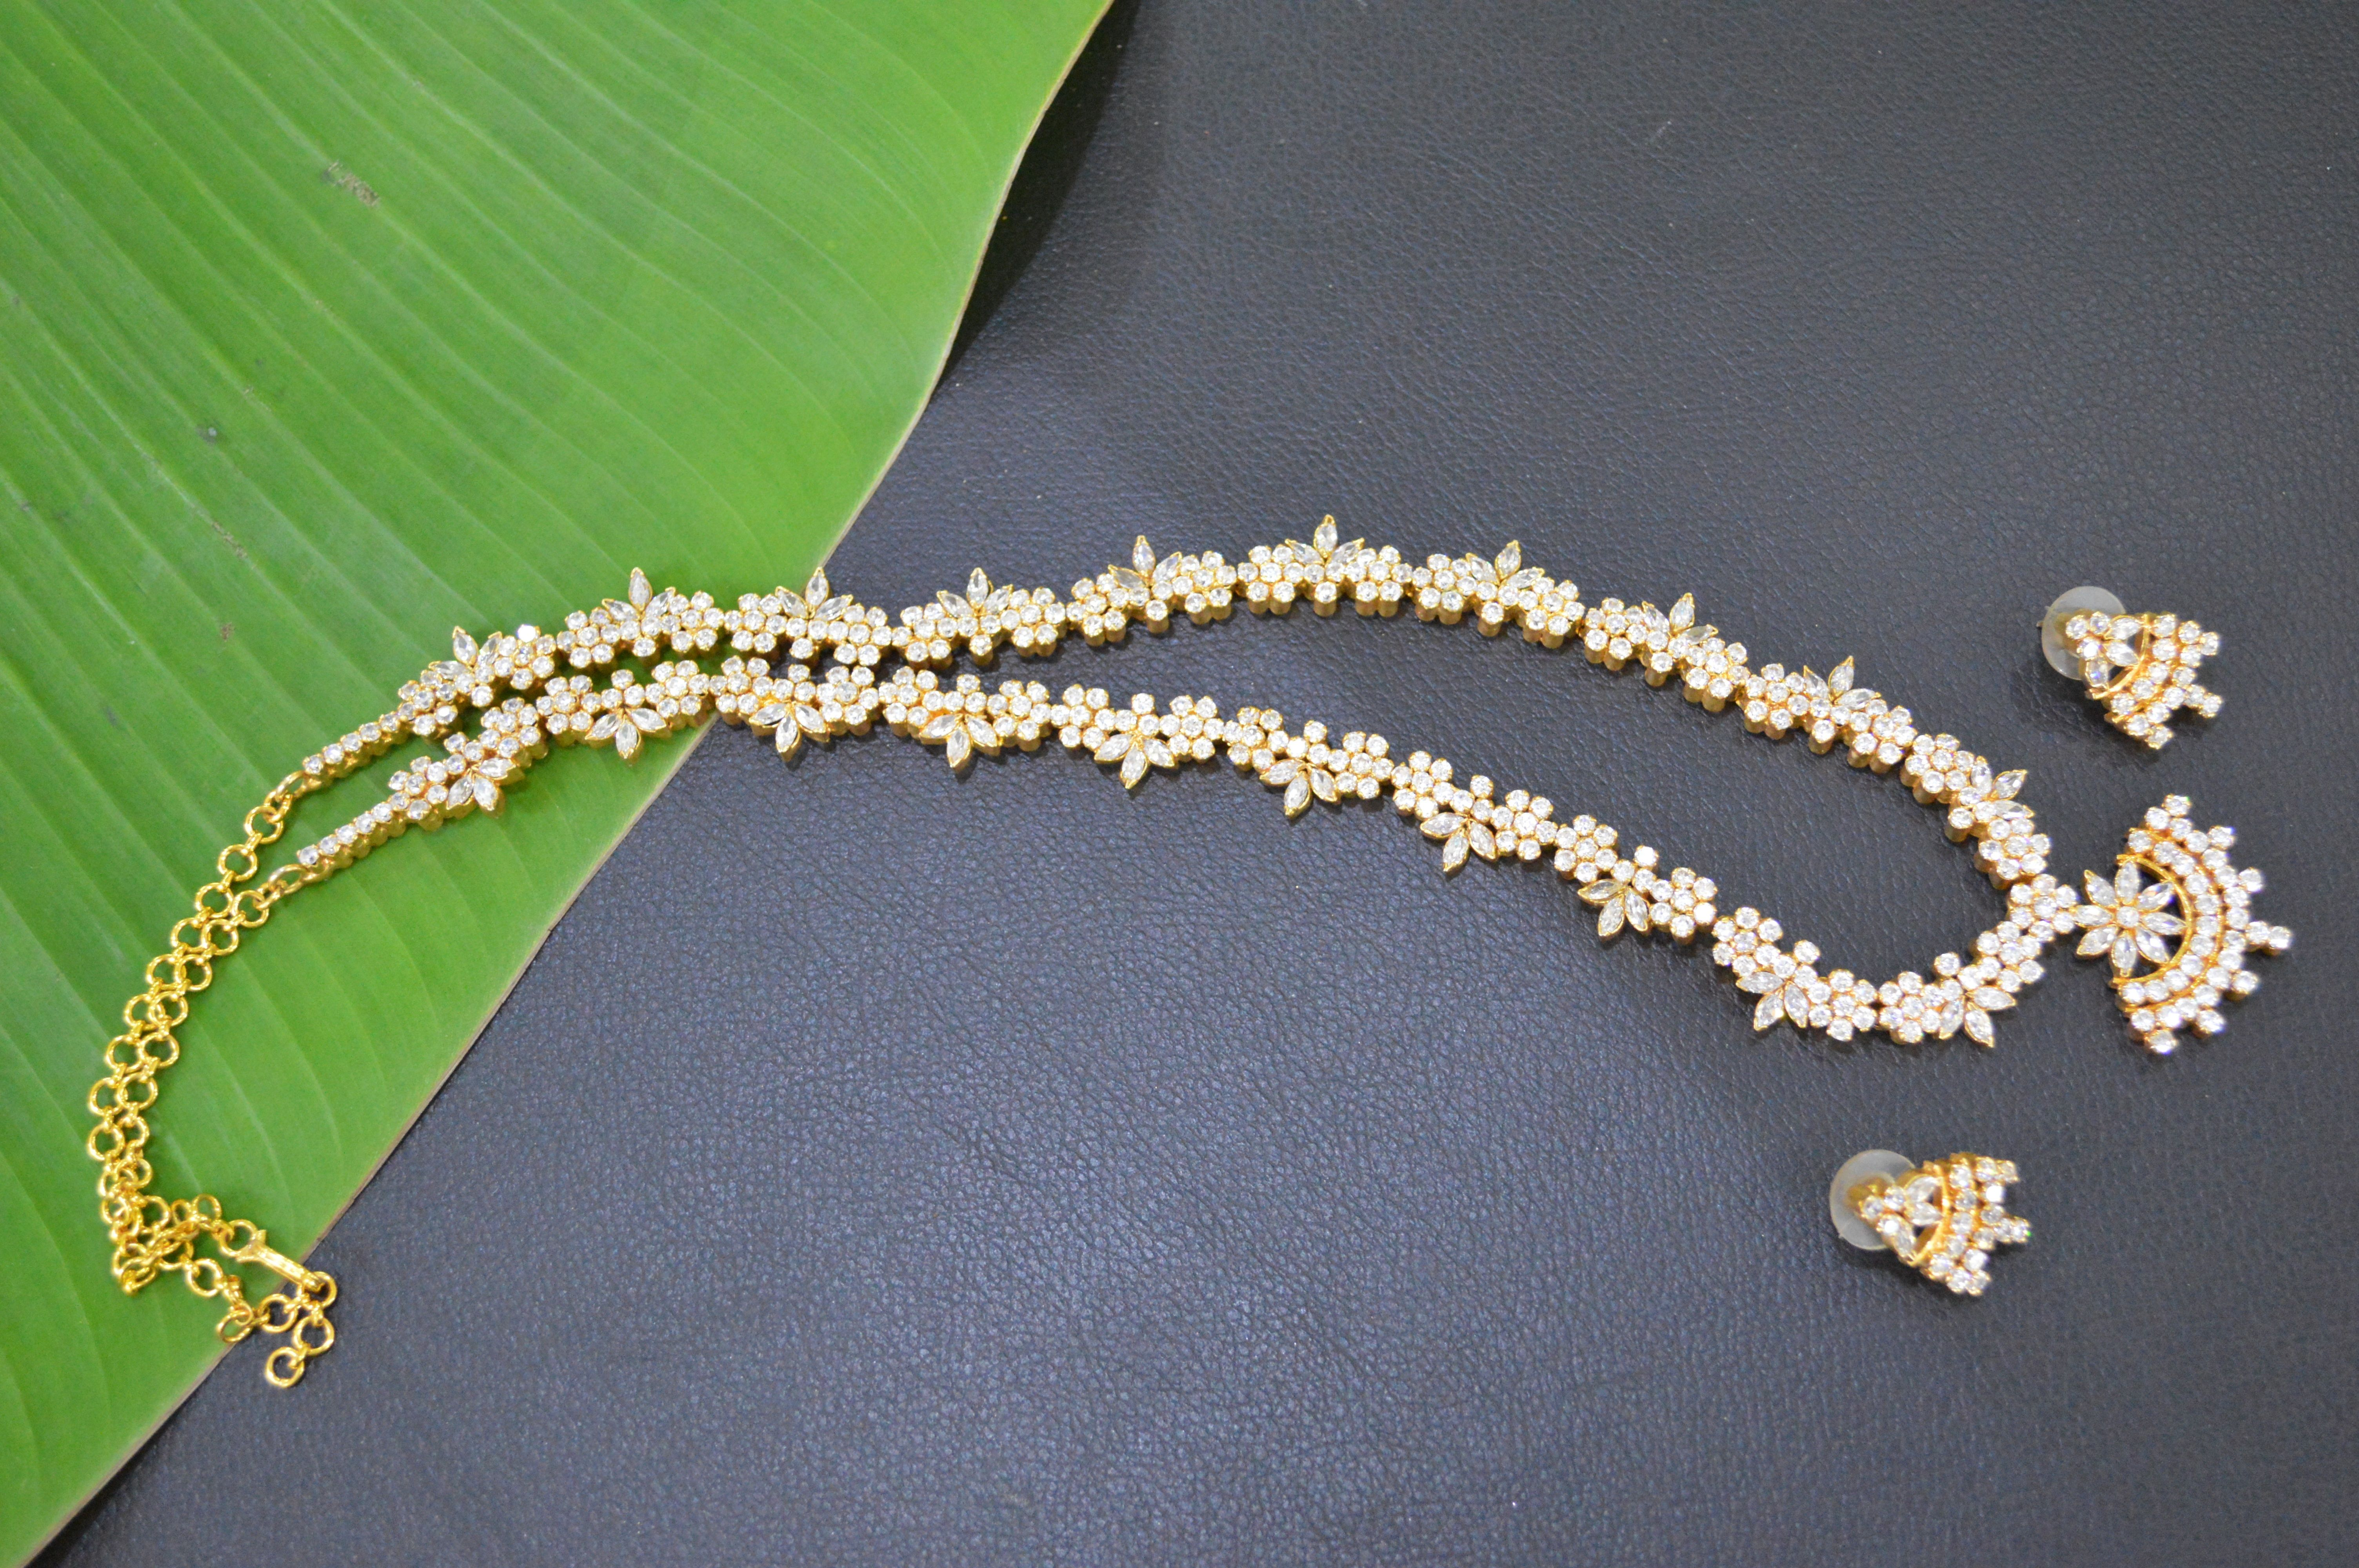 CZ Haram 1 gm gold or imitation jewelry Chaitra Jewells